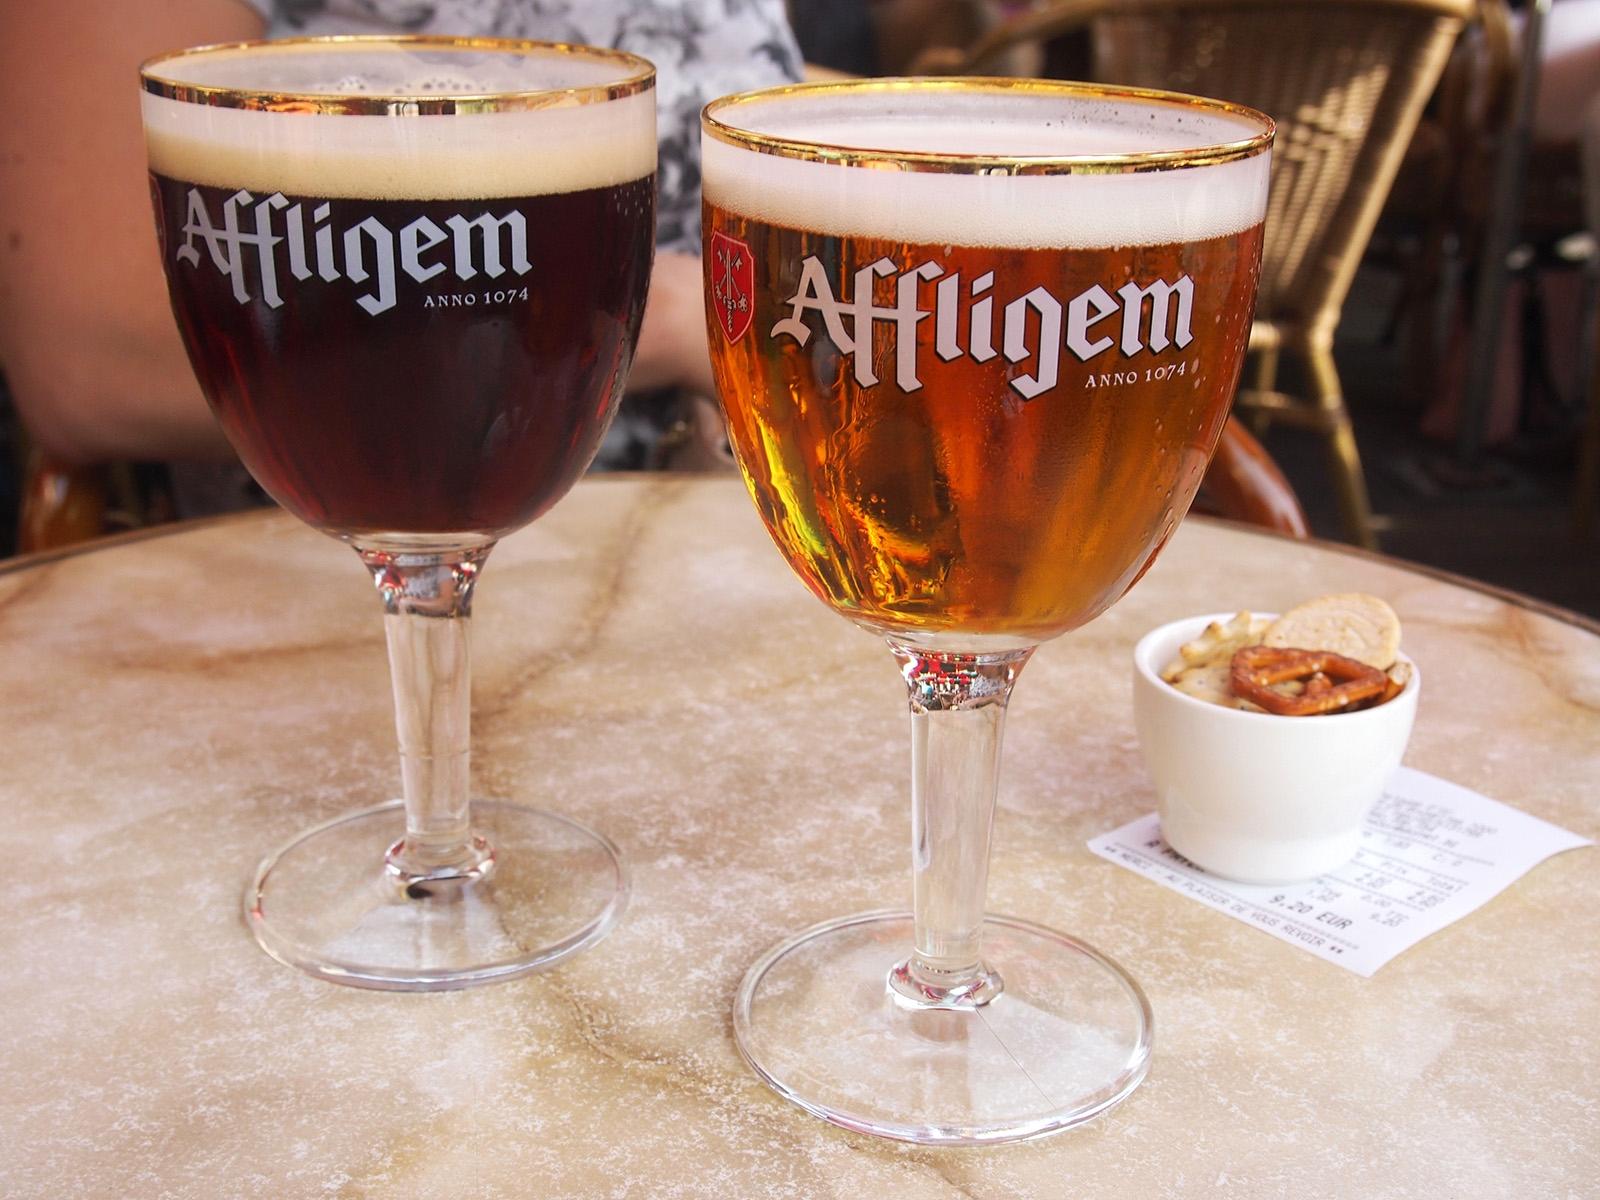 Belgické pivo Affligem, založené roku 1074